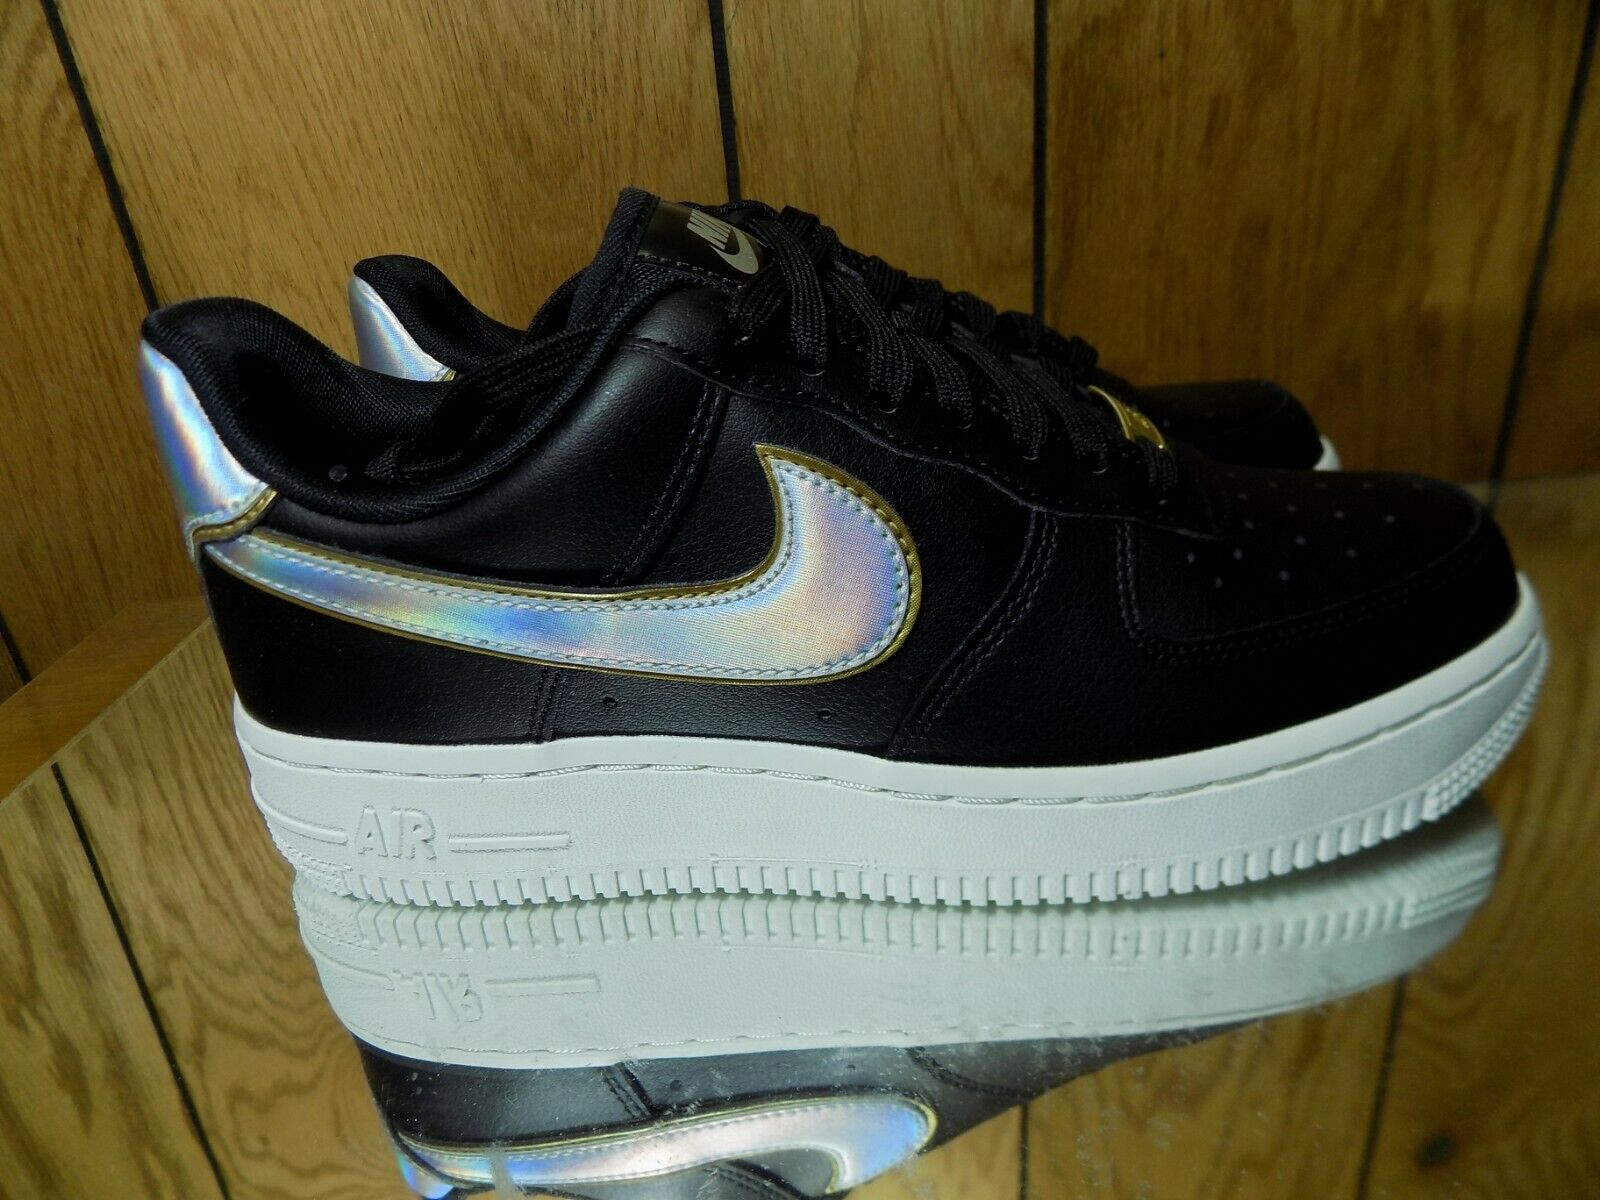 Nike WMNS Air Force Force Force 1 '07 MTLC [AR0642-002] Black Platinum Women's Size 6.5 04aefa